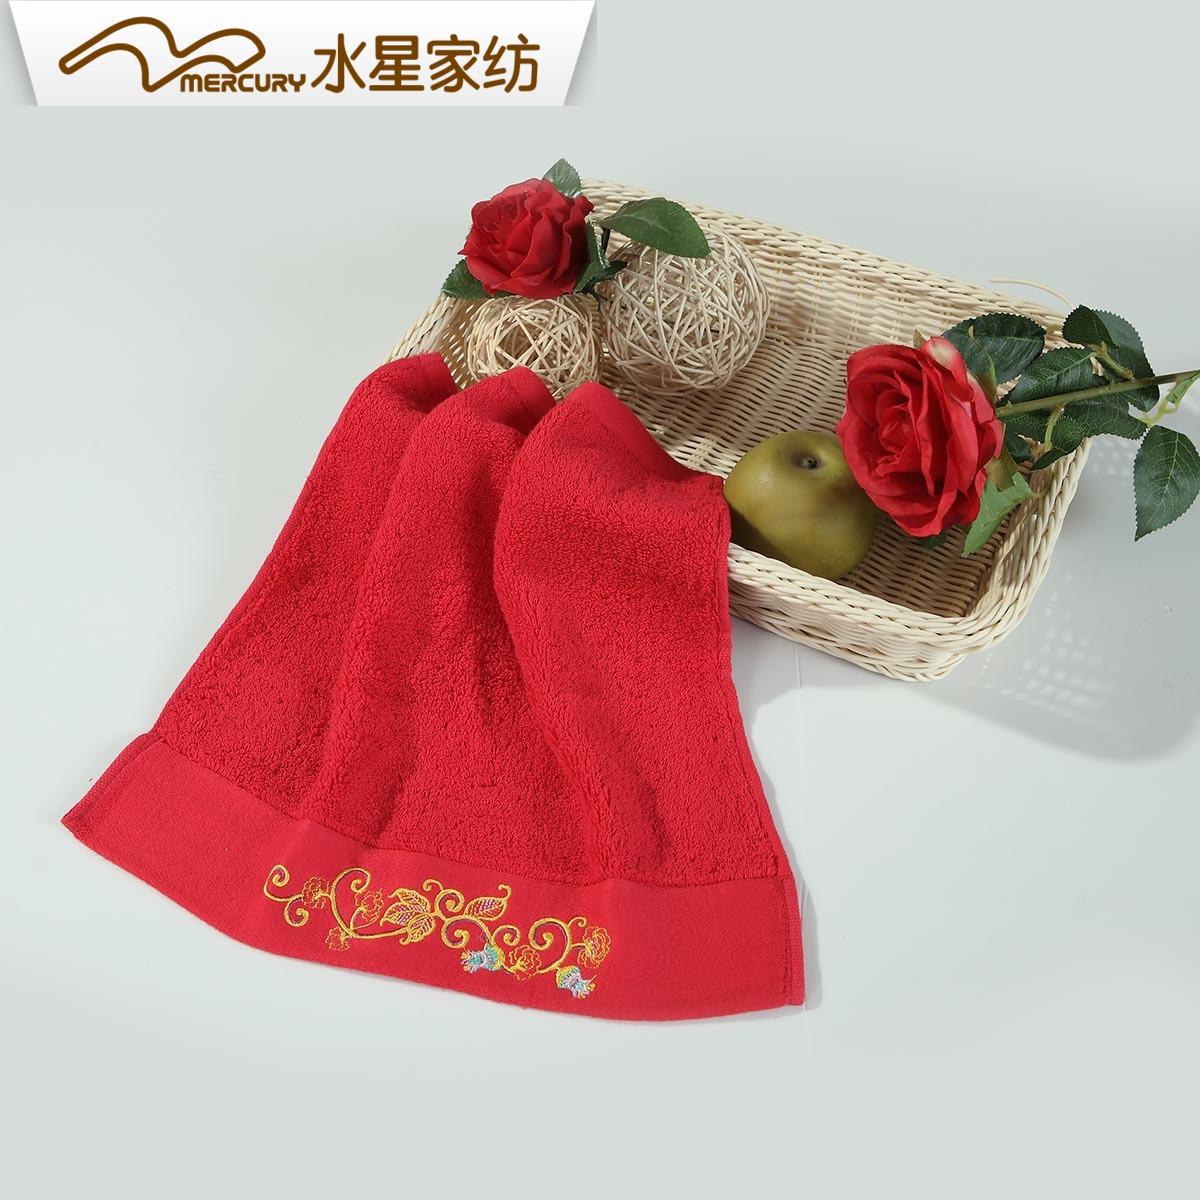 Полотенце Mercury home textile Wedding Pavilion lhm04501